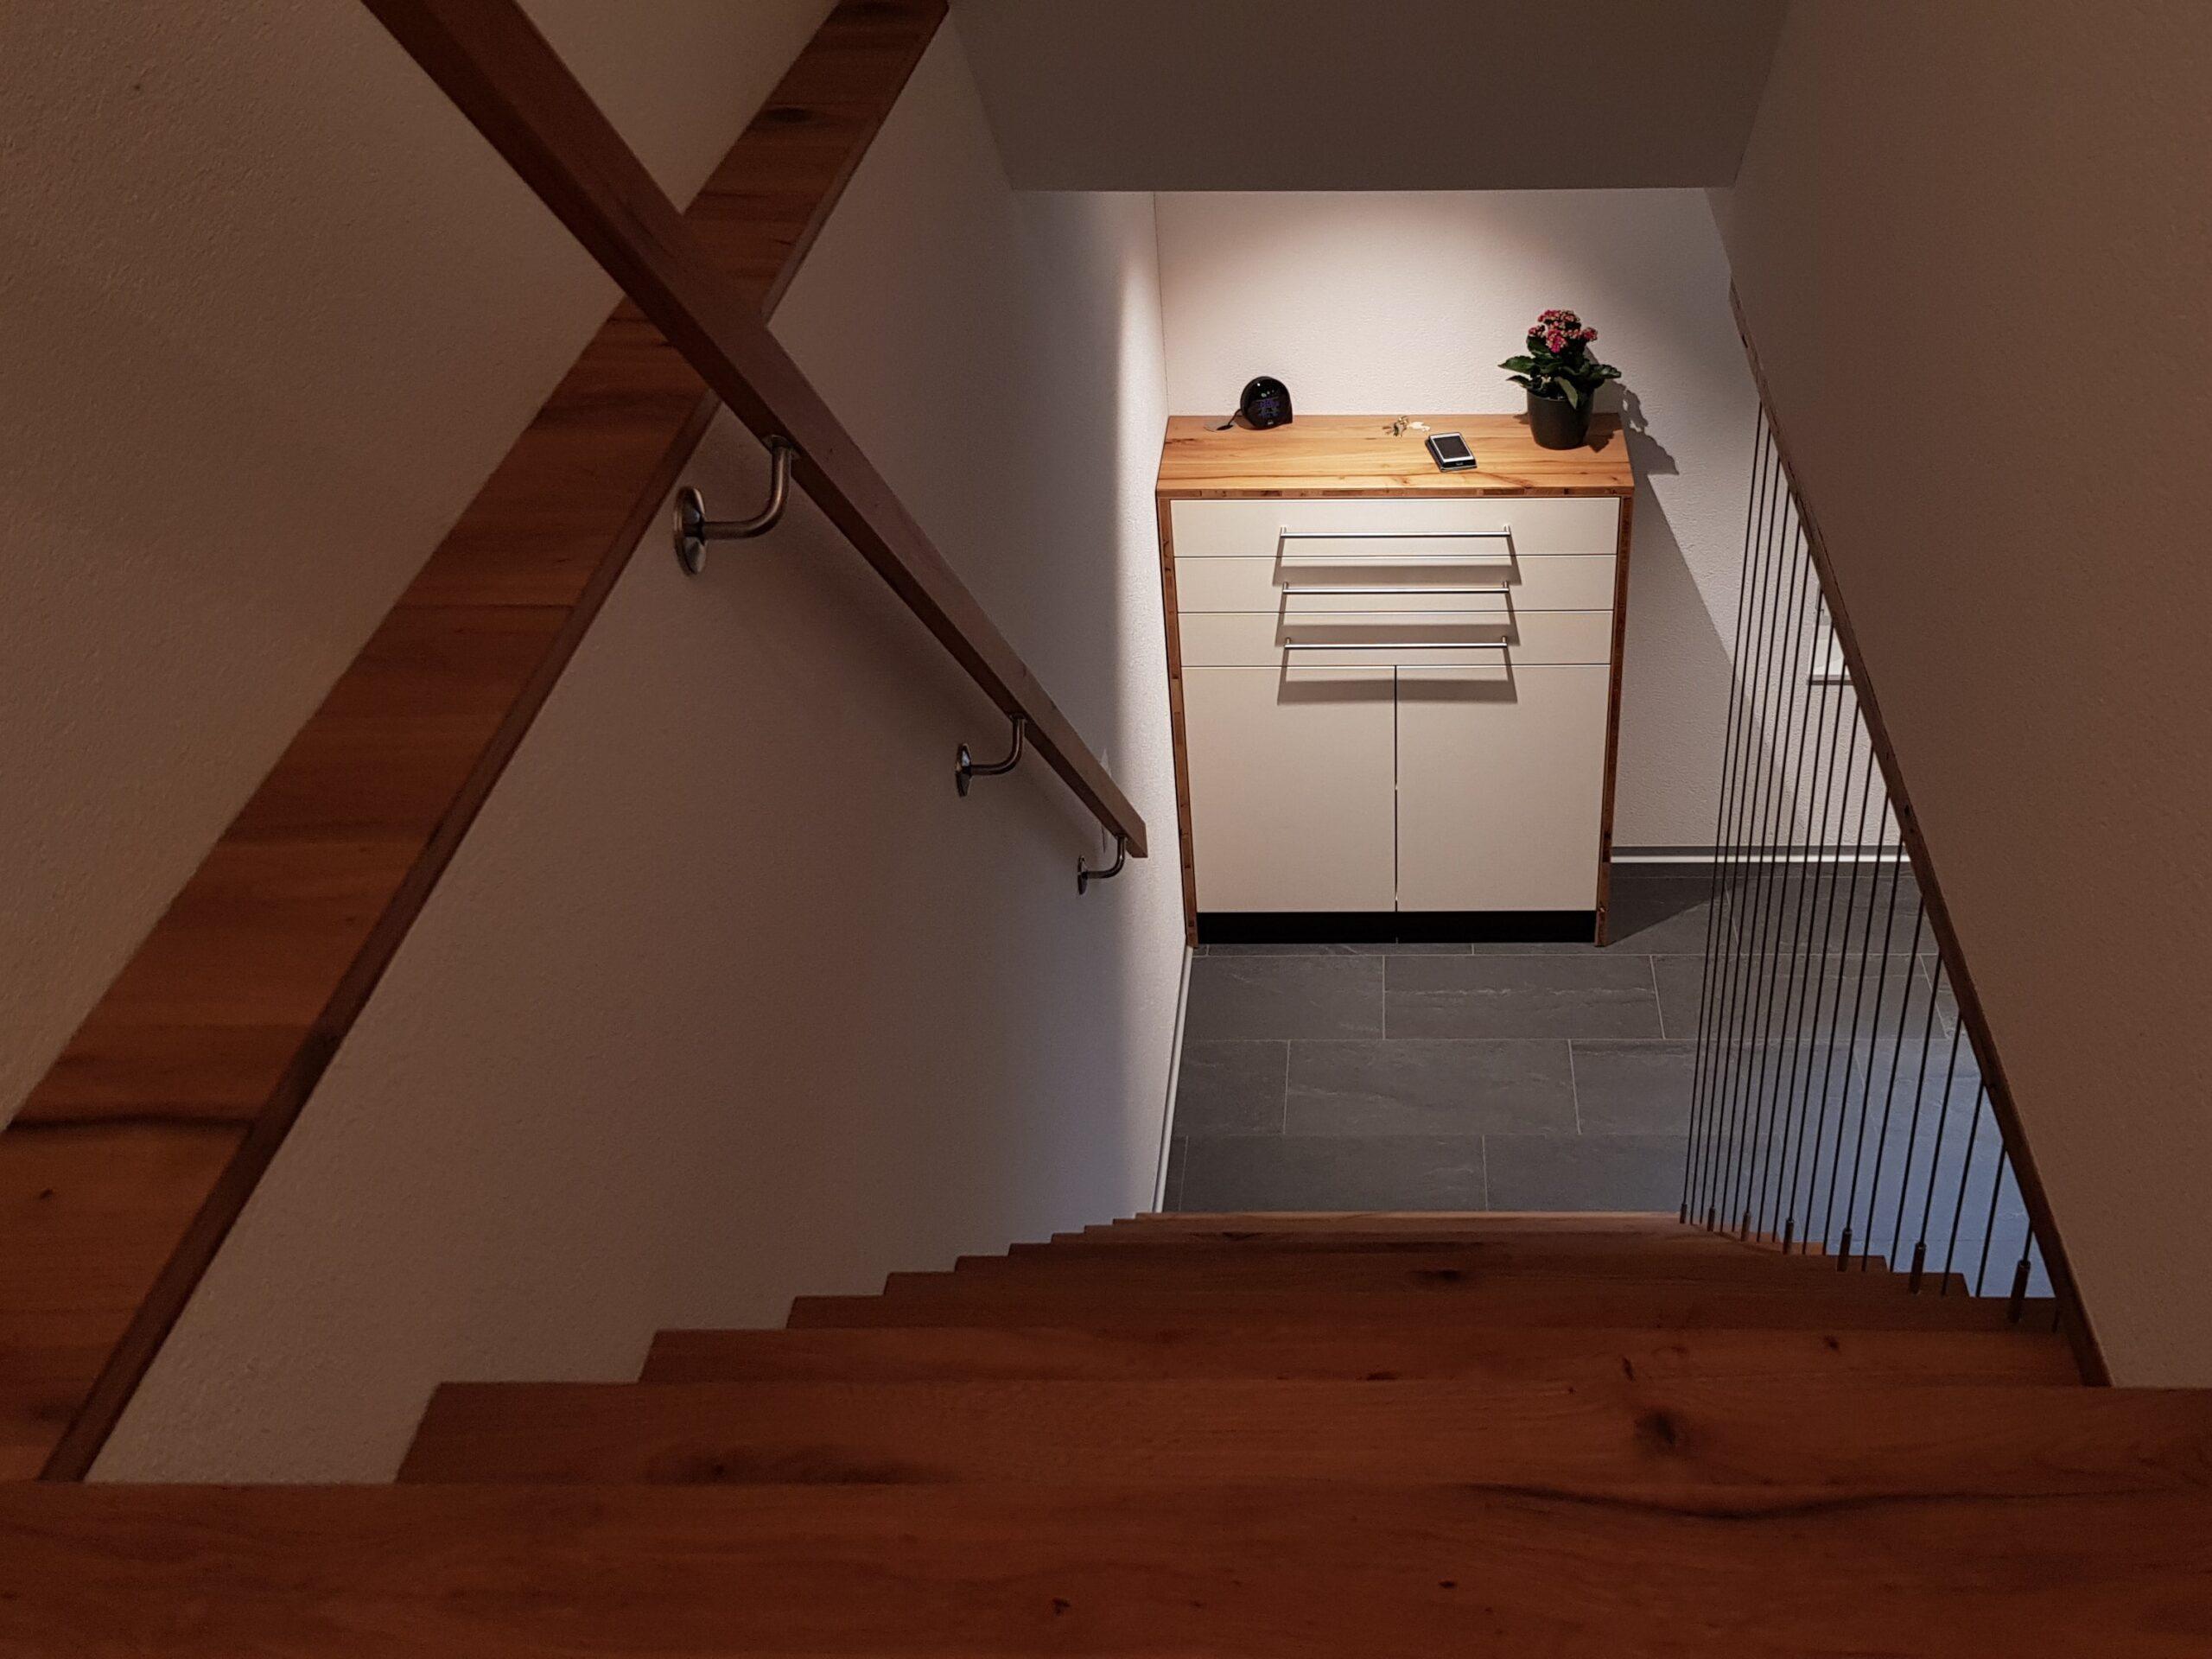 Wooddesign_Treppen_Teppengeländer_Holztreppen_Treppenverkleidung_Treppenmöbel (3)-min